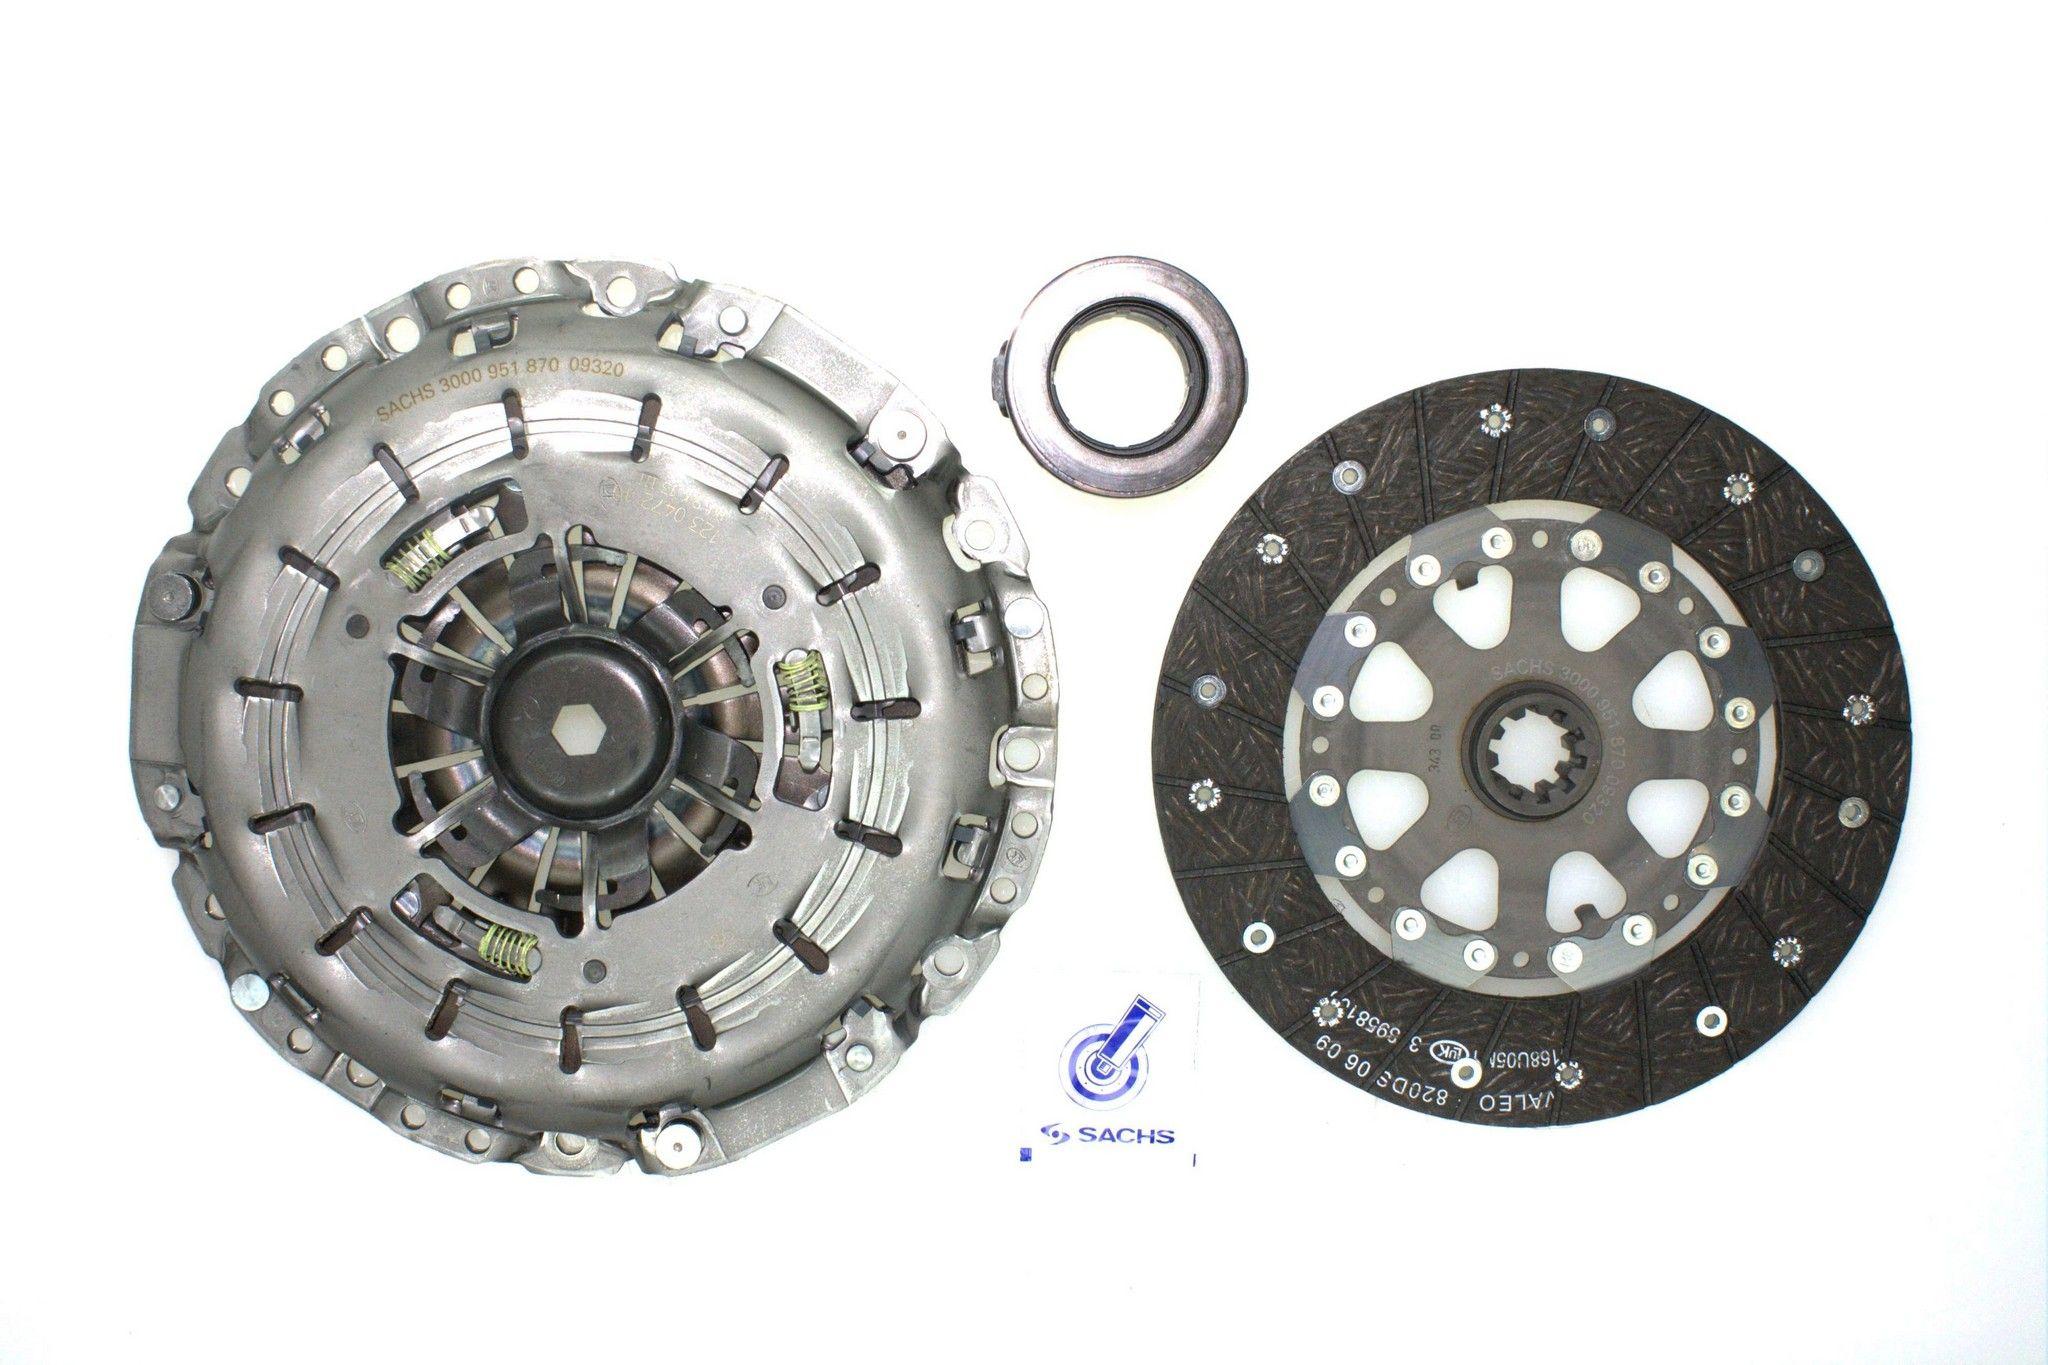 BMW Z4 Clutch Kit Replacement Exedy LUK LuK Rhino Pac Sachs